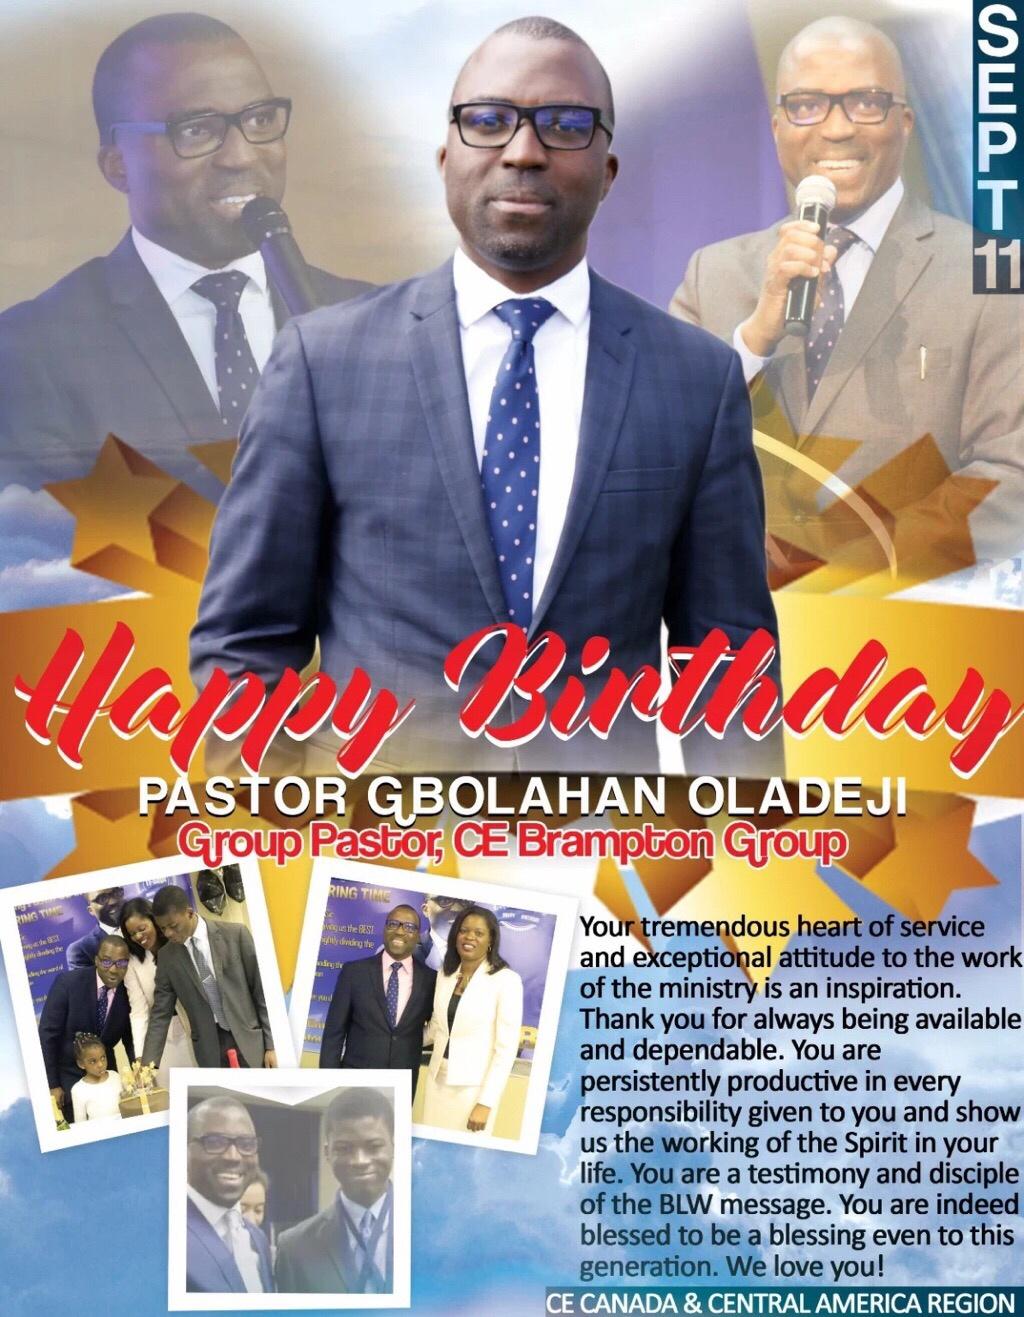 Happy Birthday Pastor Sir! I